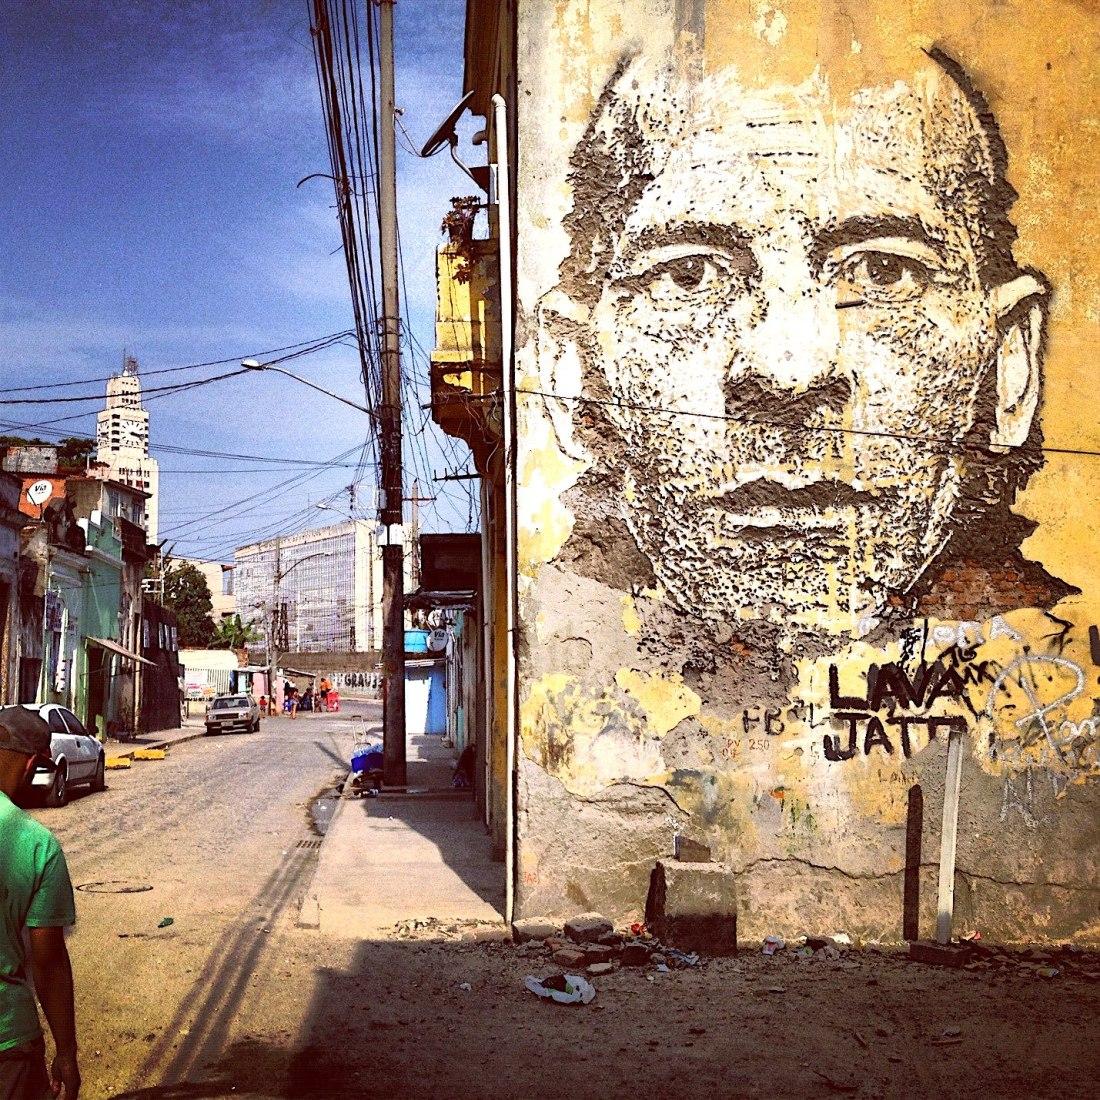 Rio De Janeiro, Brazil, South America, Yellow Fever, KOLUMN Magazine, KOLUMN